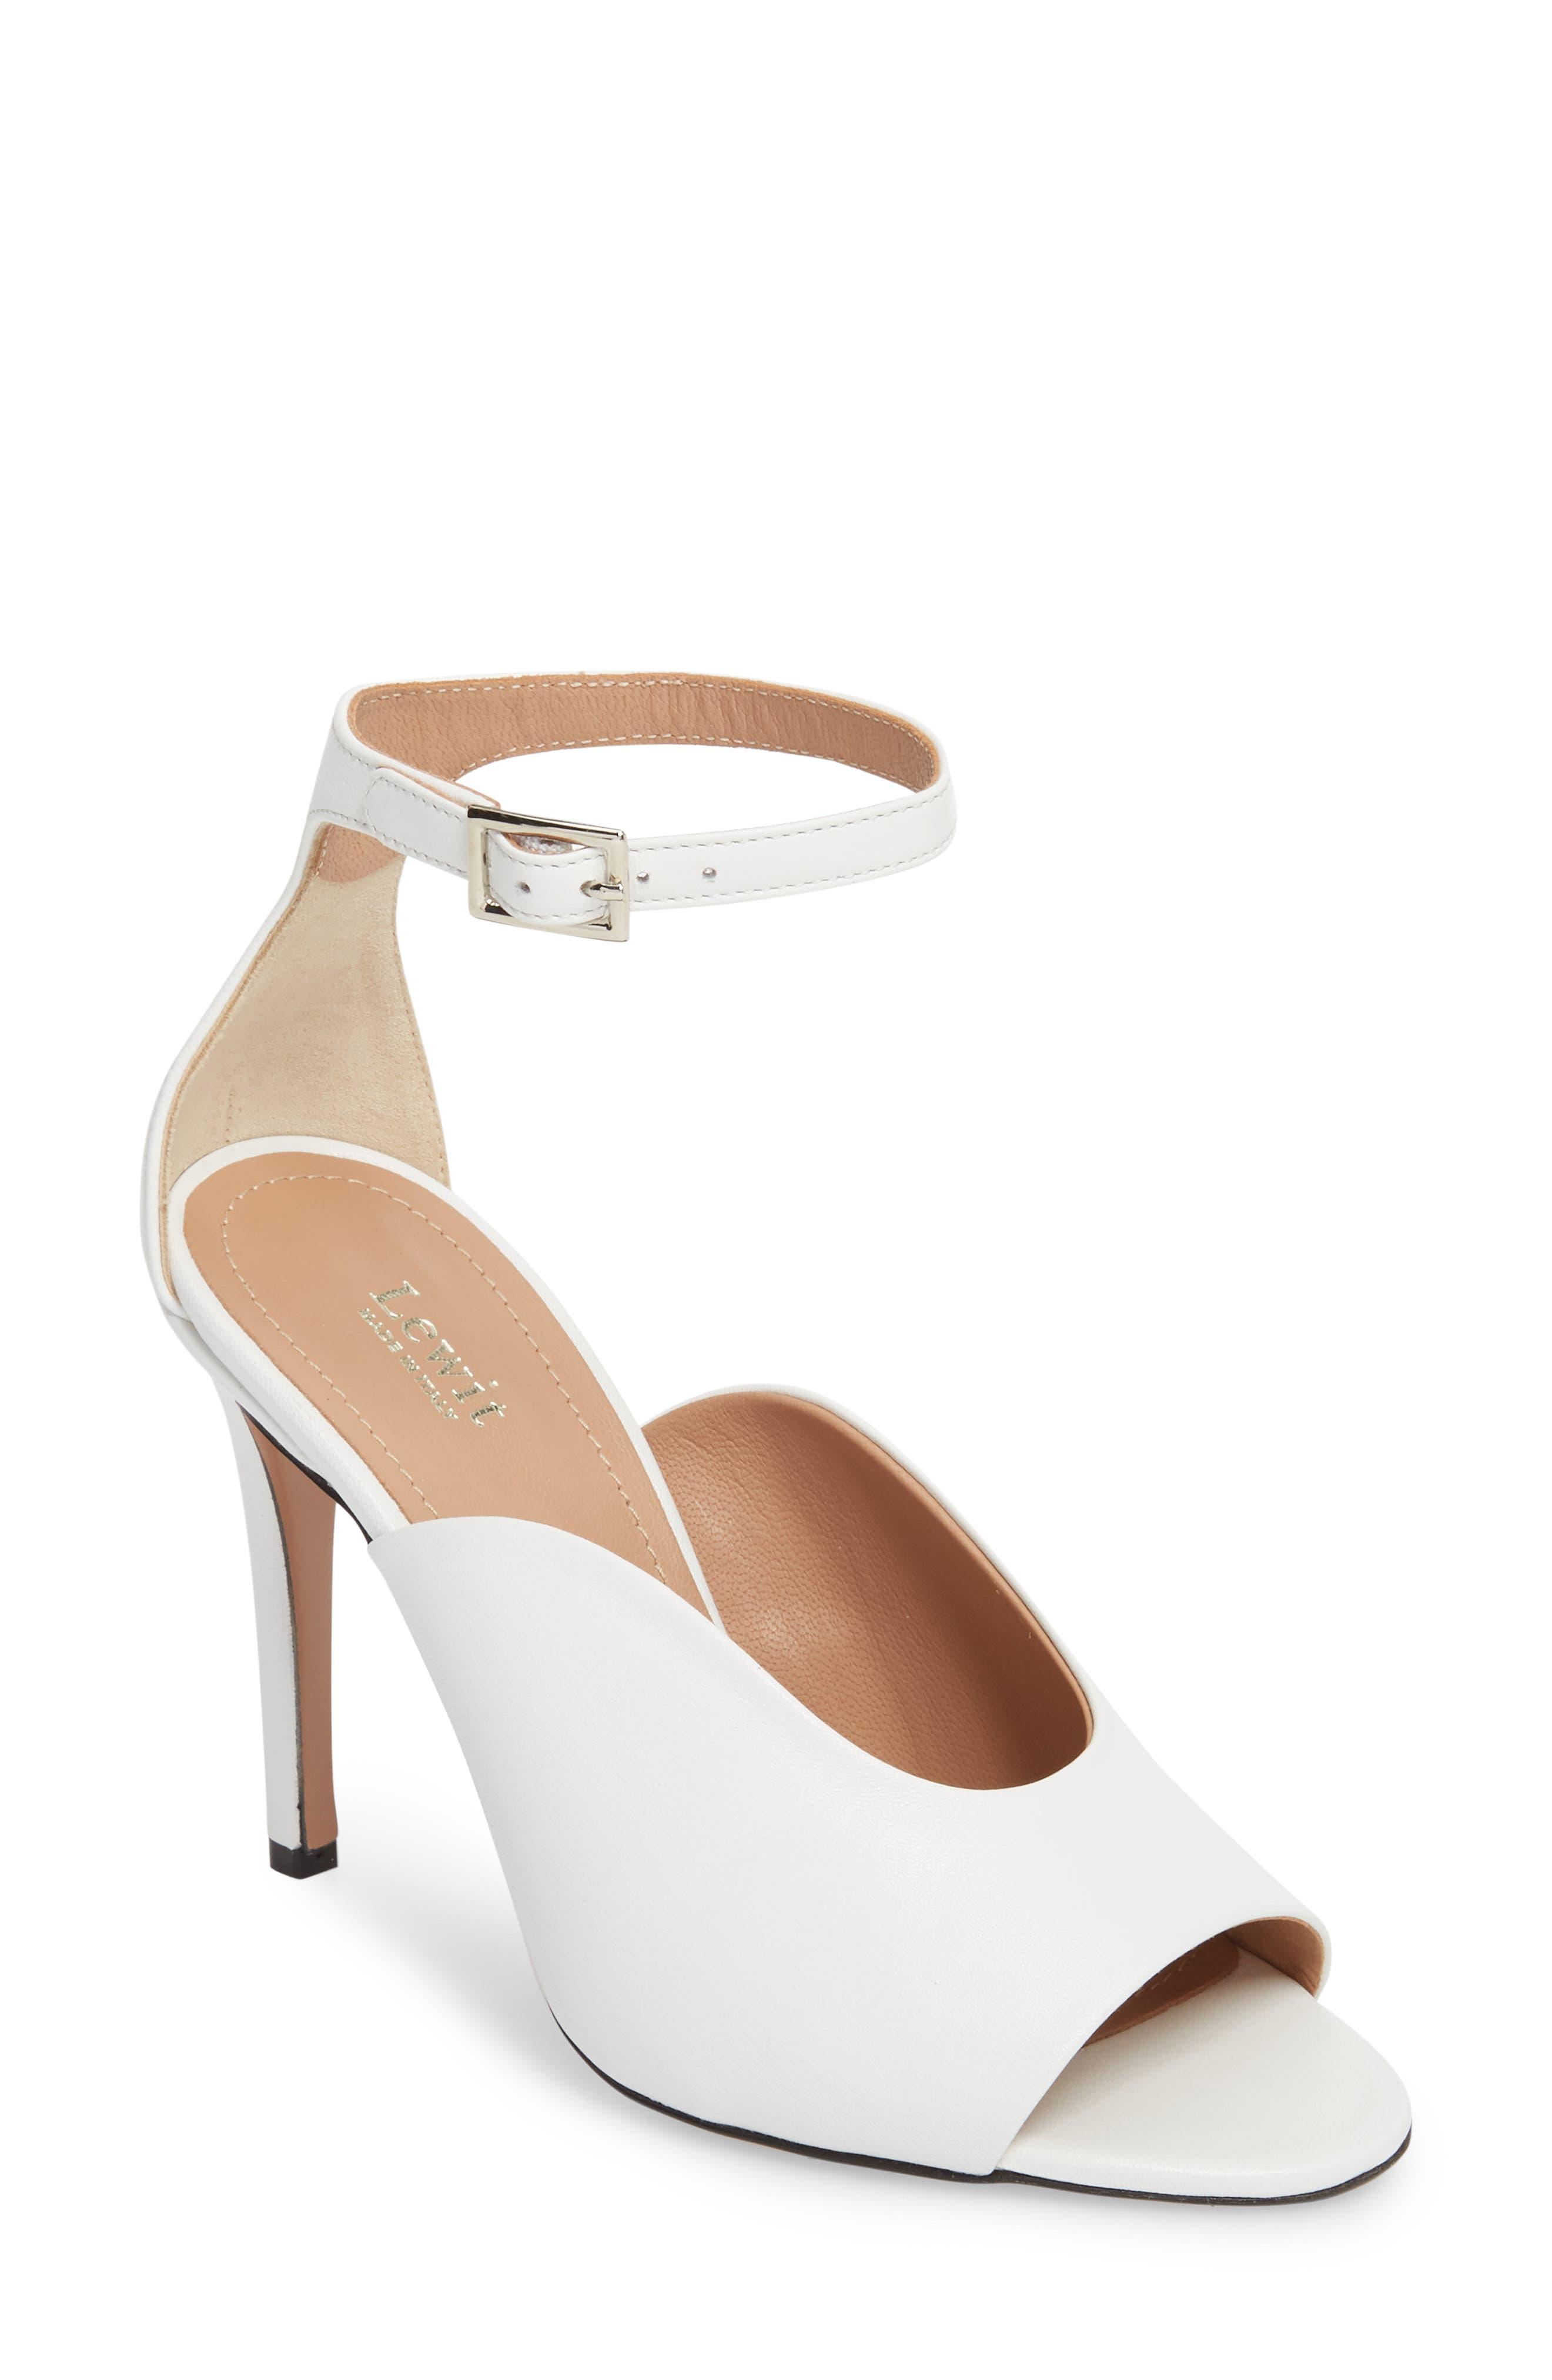 Rosalia Halo Strap Sandal,                         Main,                         color, White Leather